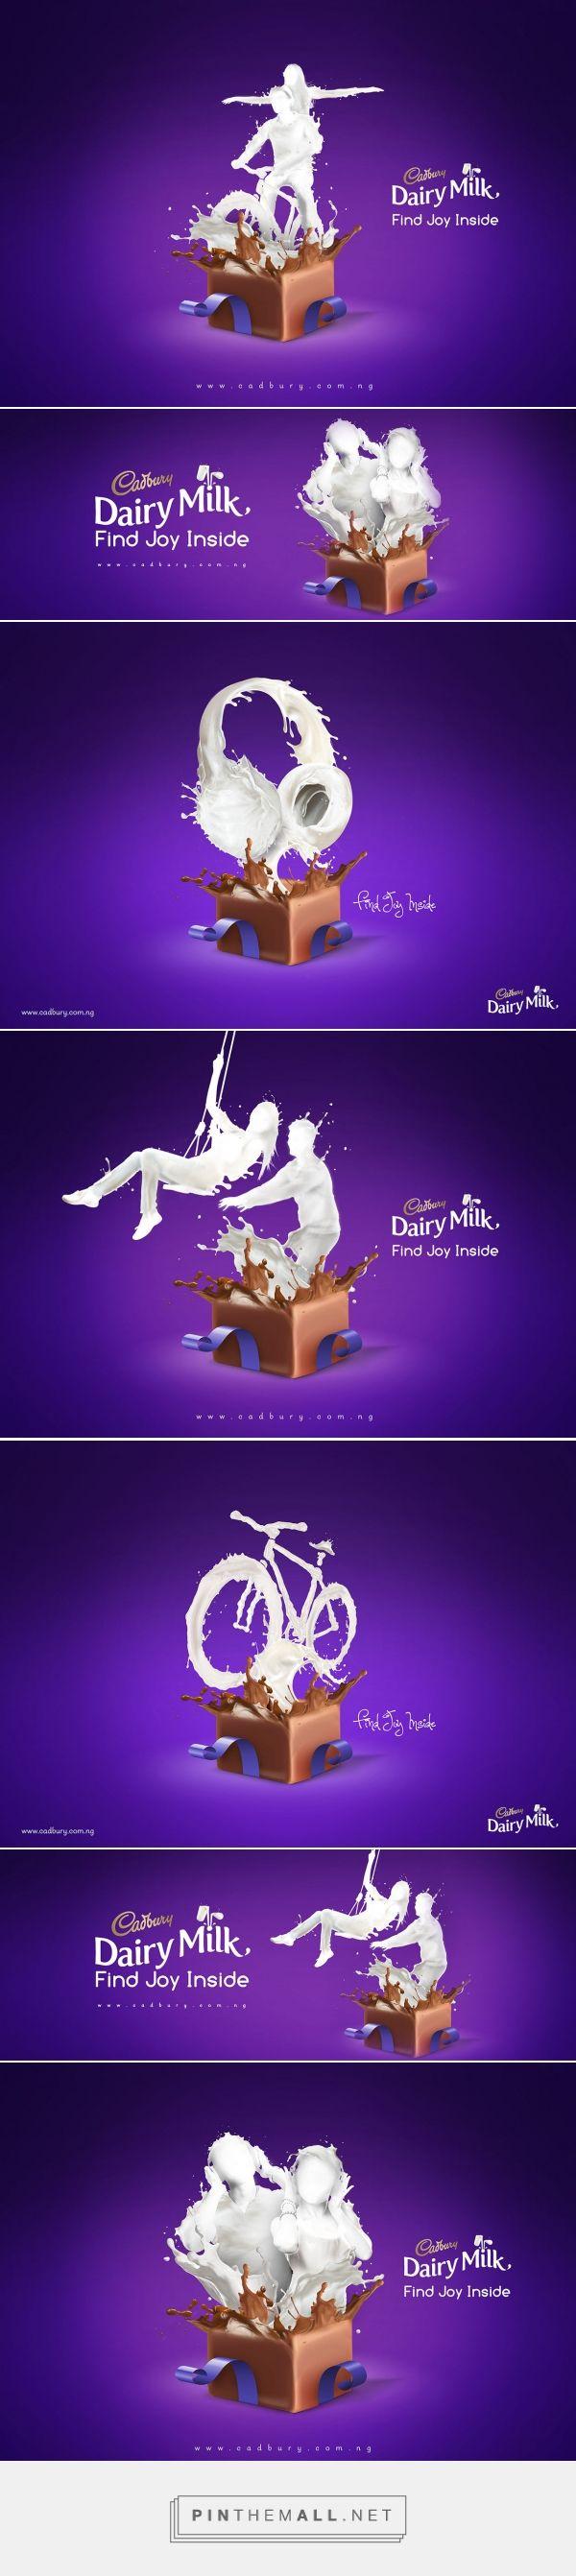 MILK AND CHOCOLATE: A Cadbury ad proposal by Ernicio Omaggi | BrandNG - created via http://pinthemall.net